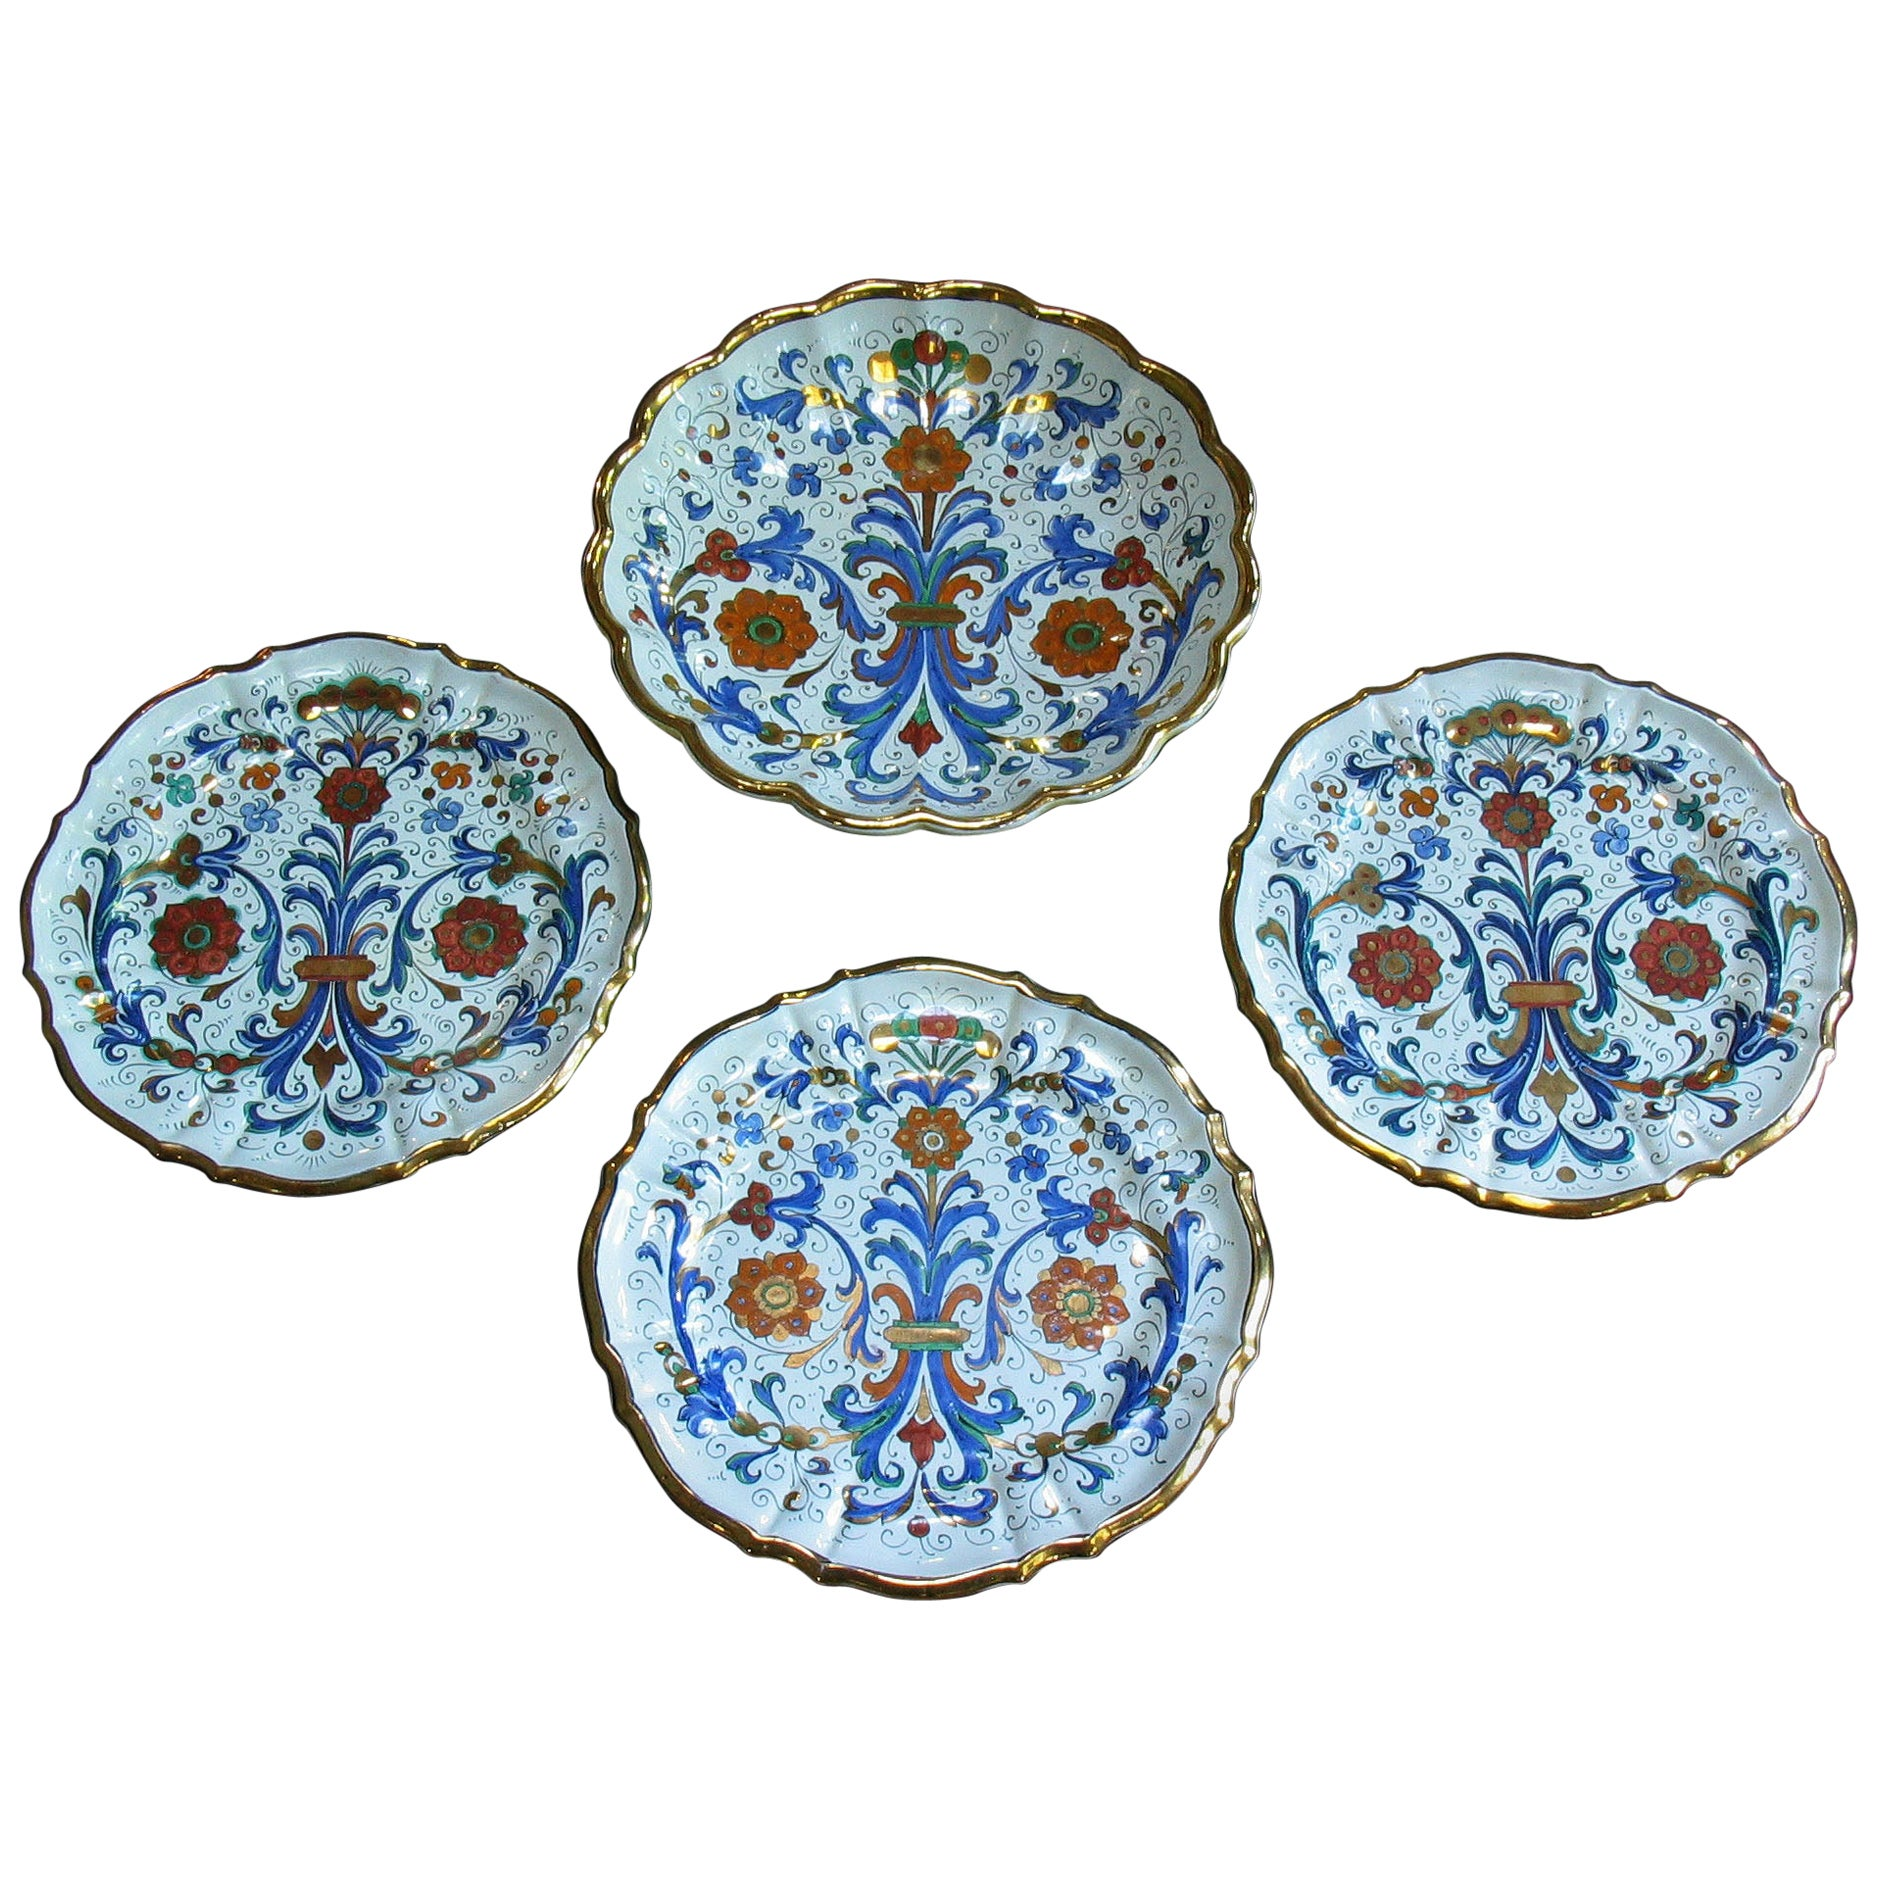 Set of Four Italian Molded Deruta Majolica Dishes, 20th Century